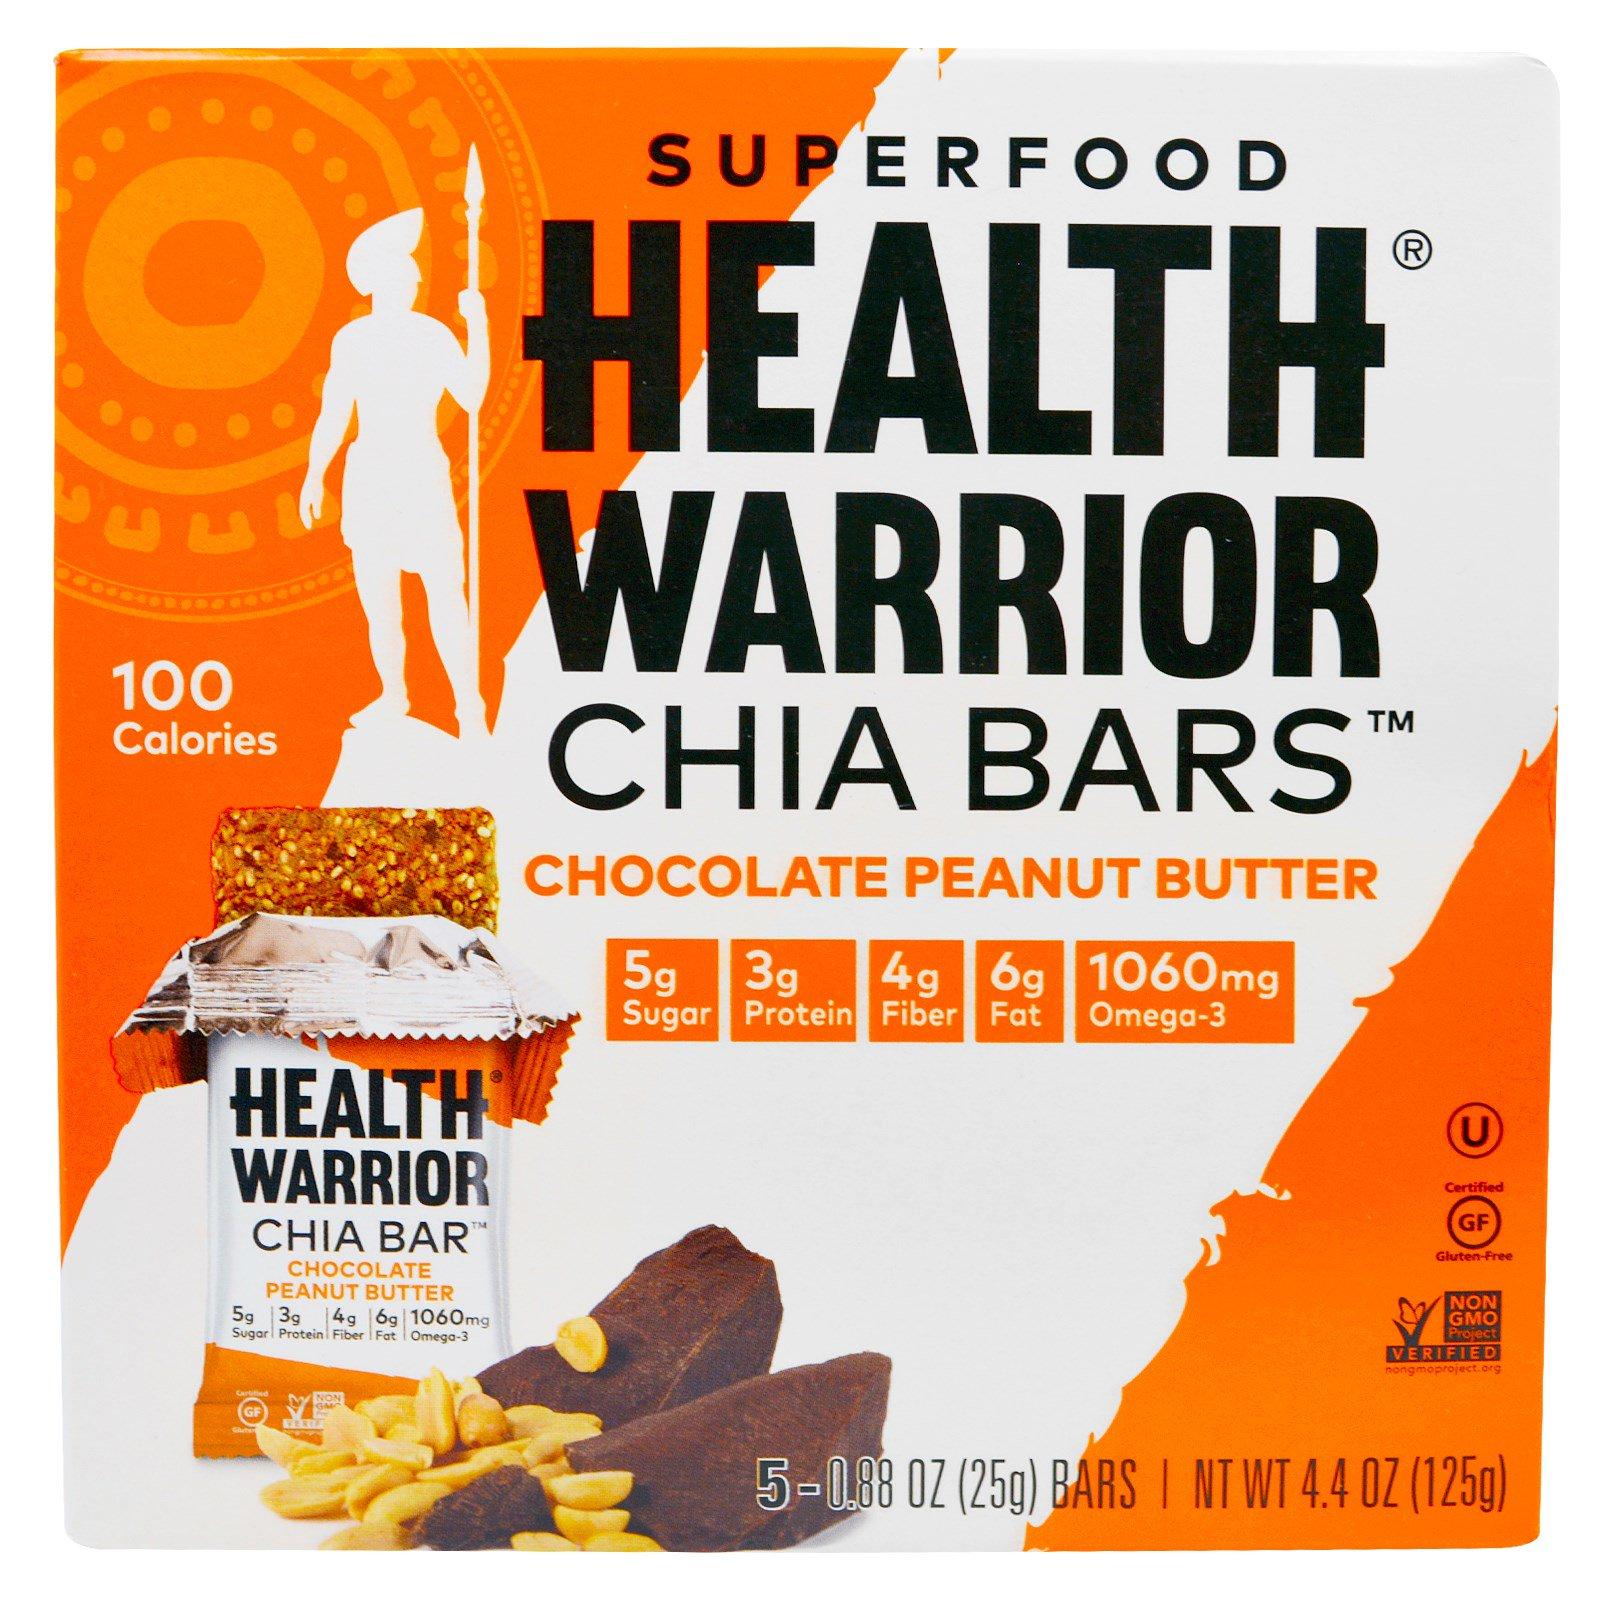 Health Warrior, Inc., Superfood батончики Chia, шоколад и арахисовое масло, 5 батончиков, 0.88 унций (25 г)